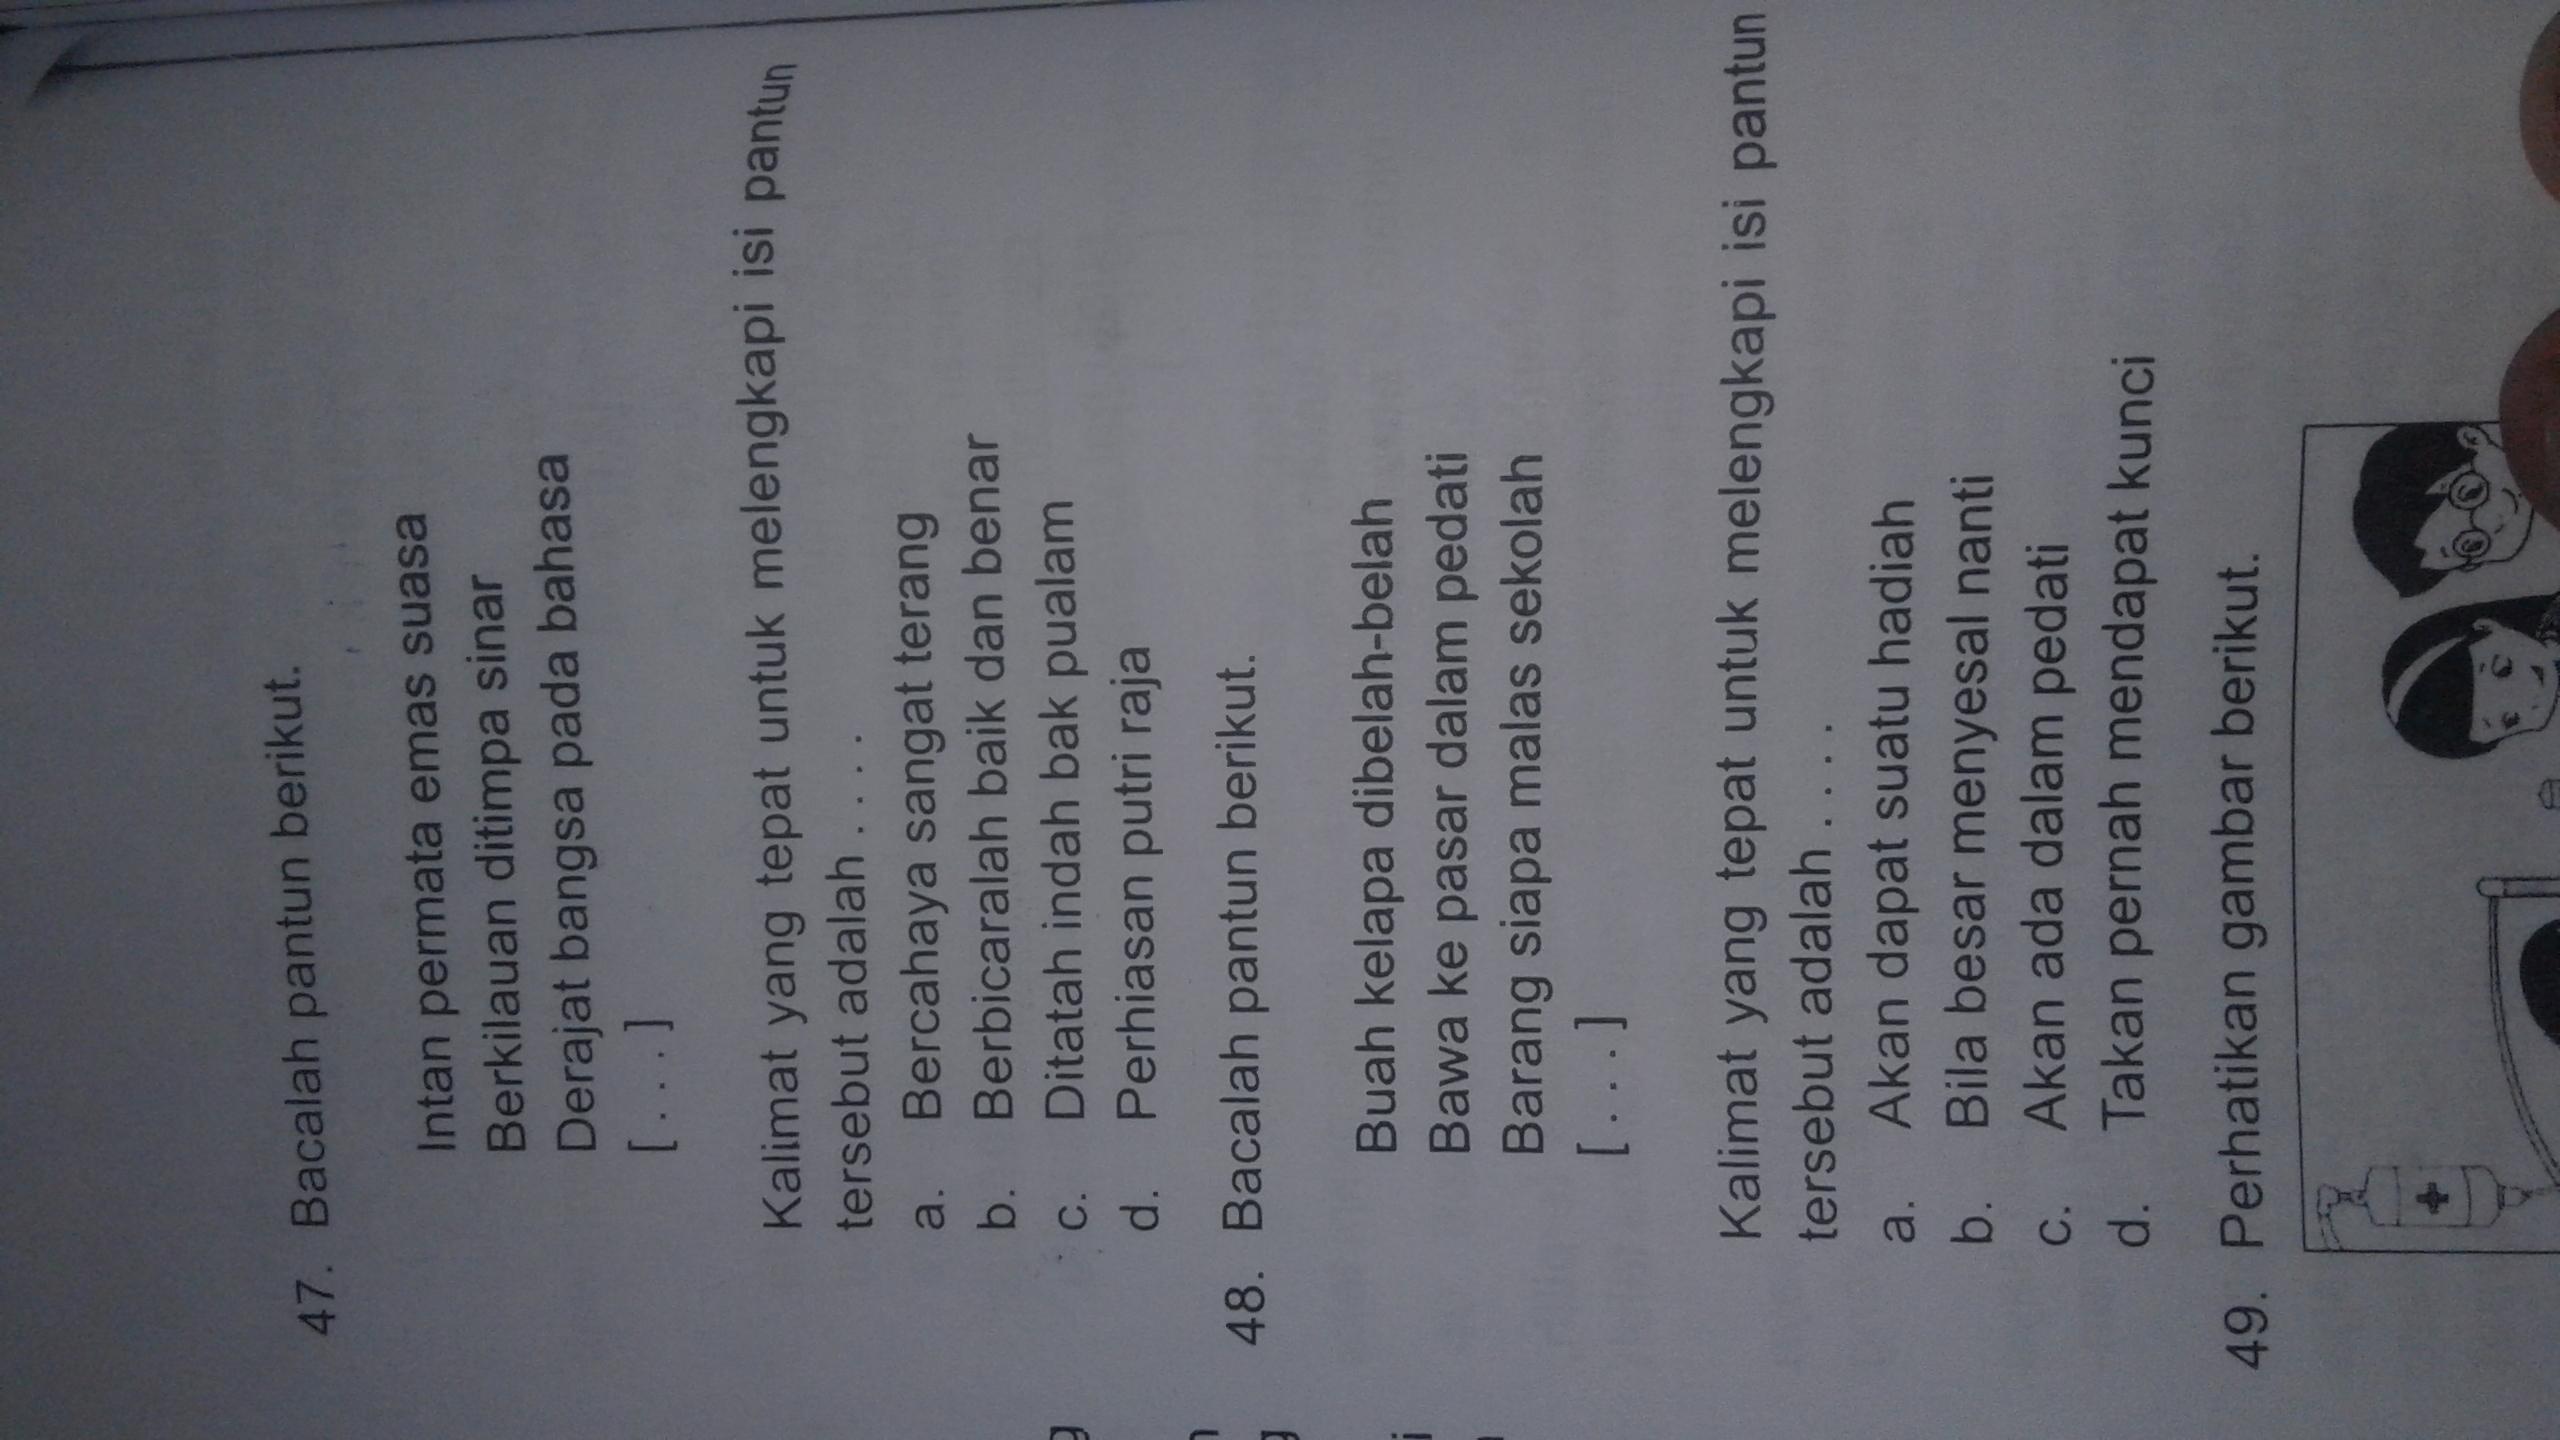 Tolong Dijawab No 47 Dan 48 Brainly Co Id